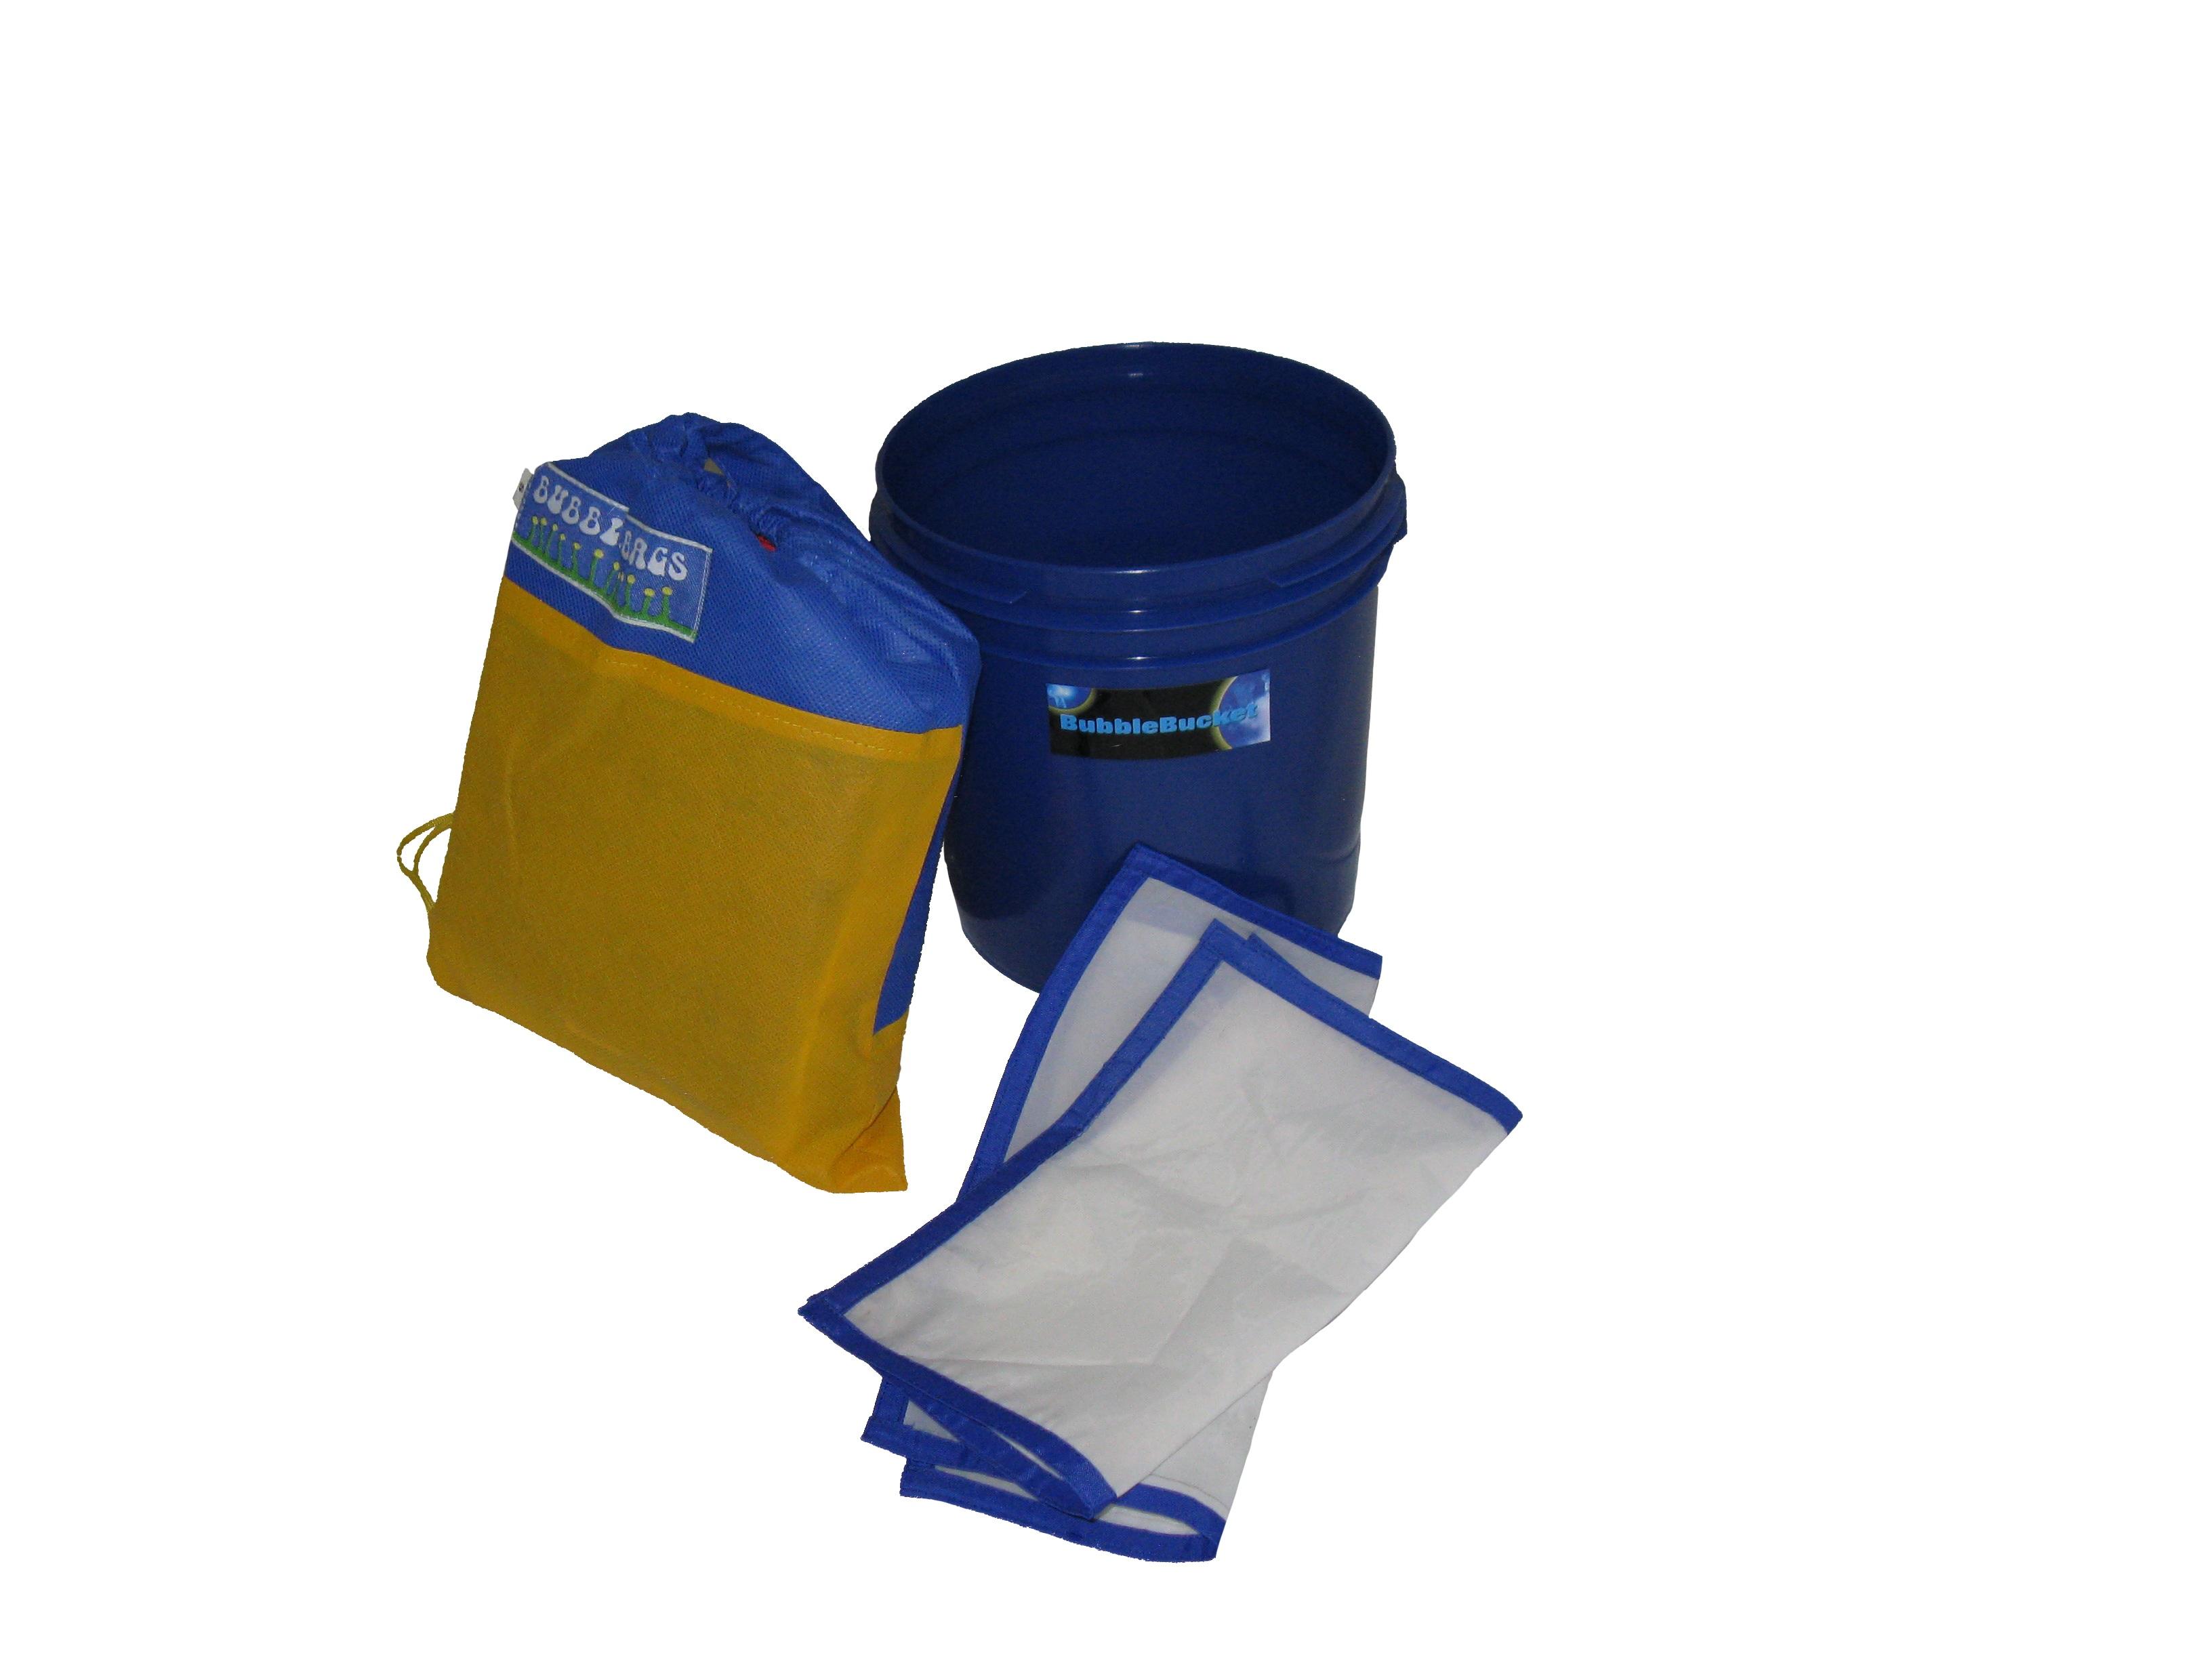 Standard 1 Gallon 8 Bag Kit: with Bucket (S8-B)